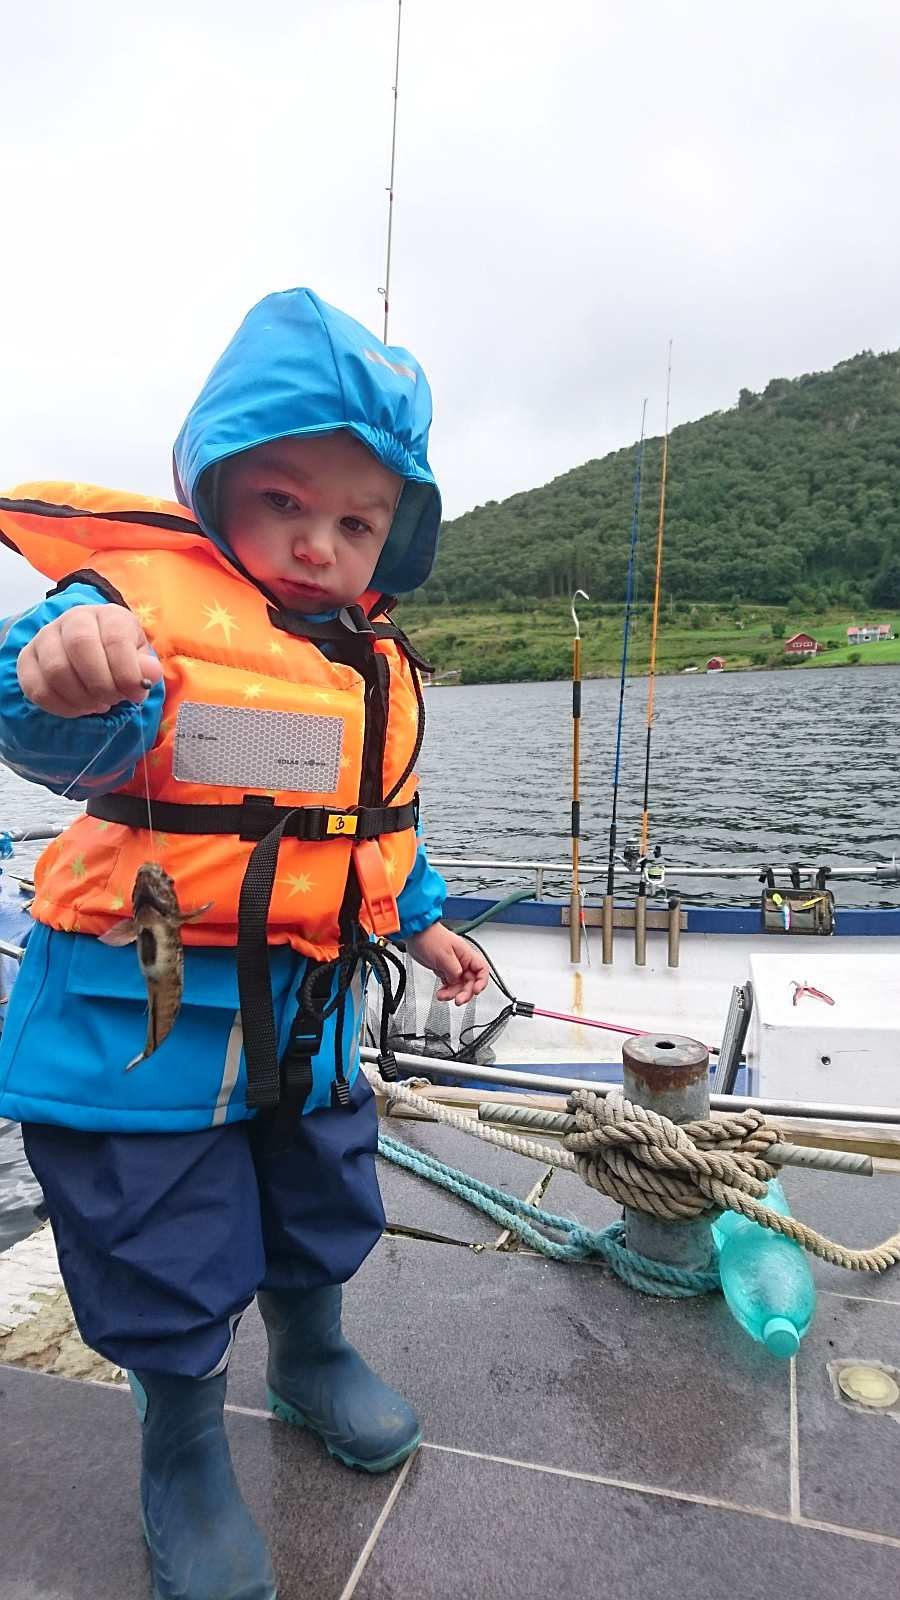 Früh übt sich der Angler-Nachwuchs am Steg